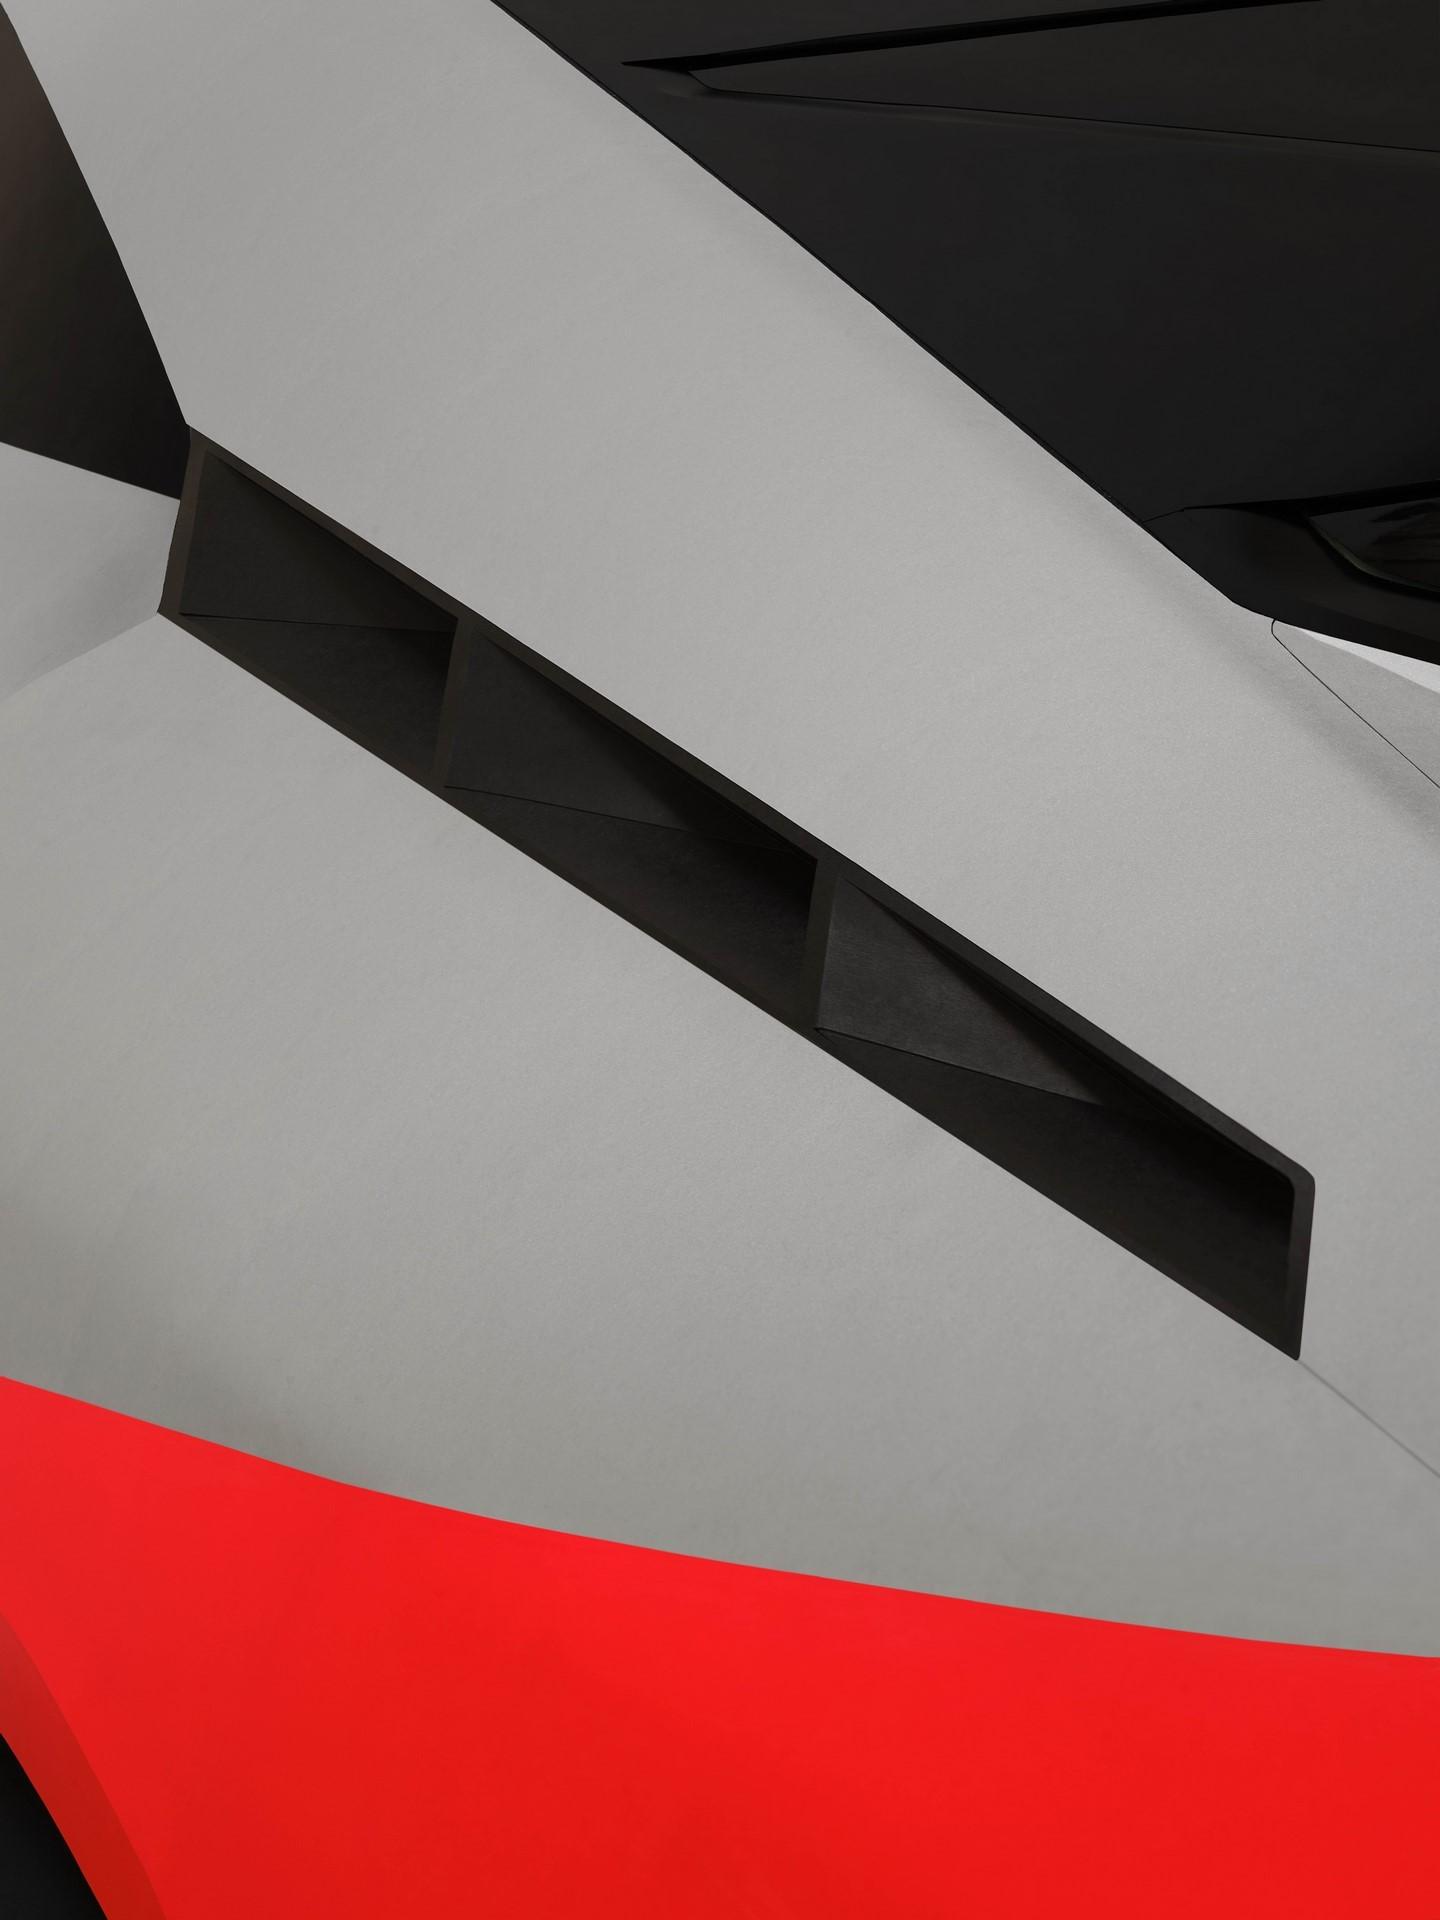 BMW-Vision-M-Next-Concept-teasers-1